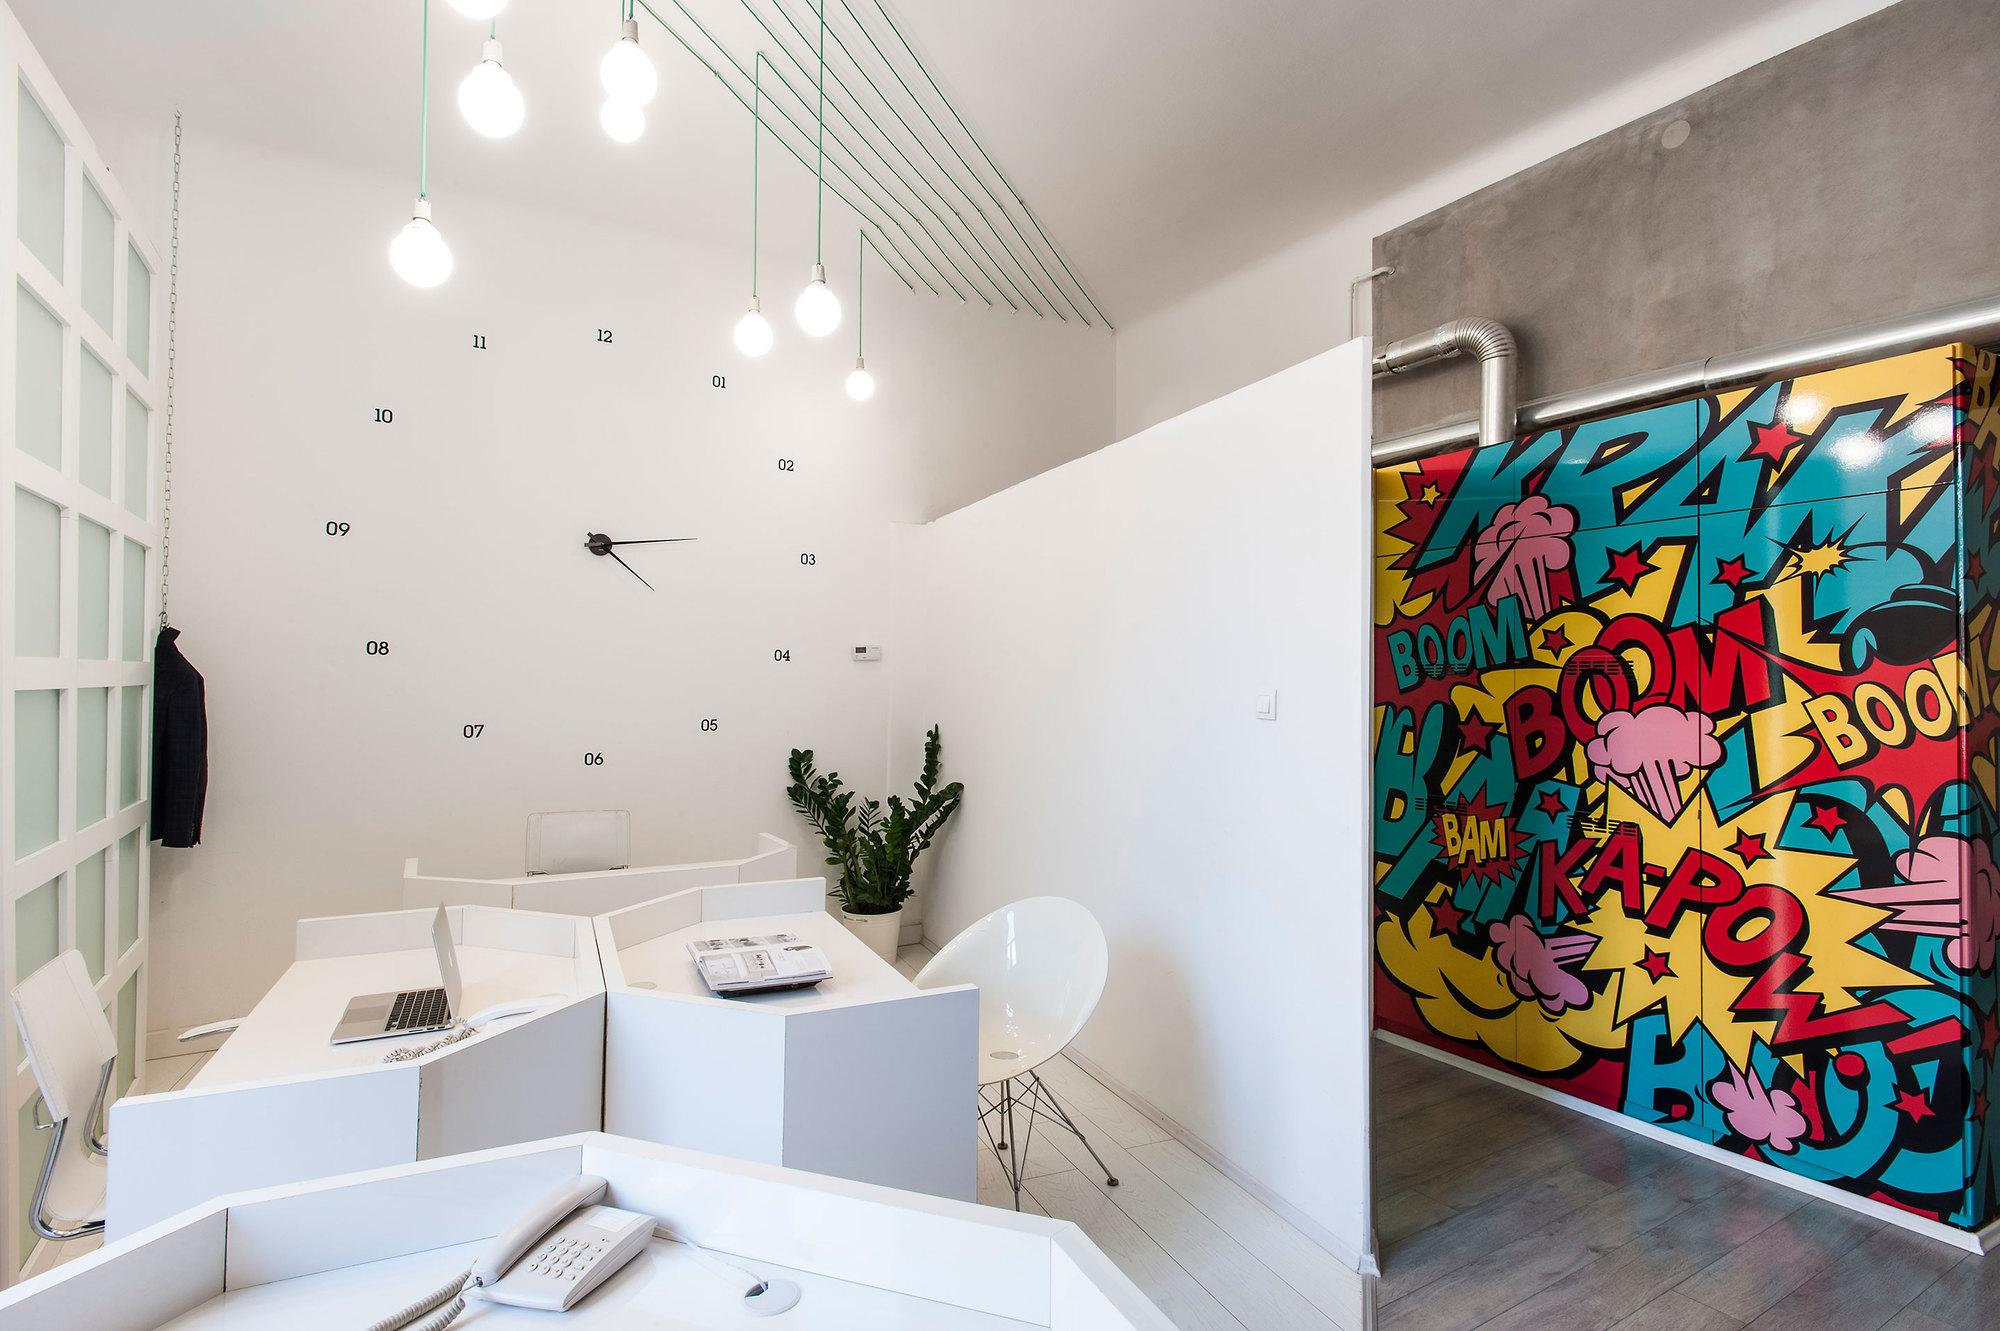 Dekoratio Branding & Design Studio in Budapest - the vandallist (7)